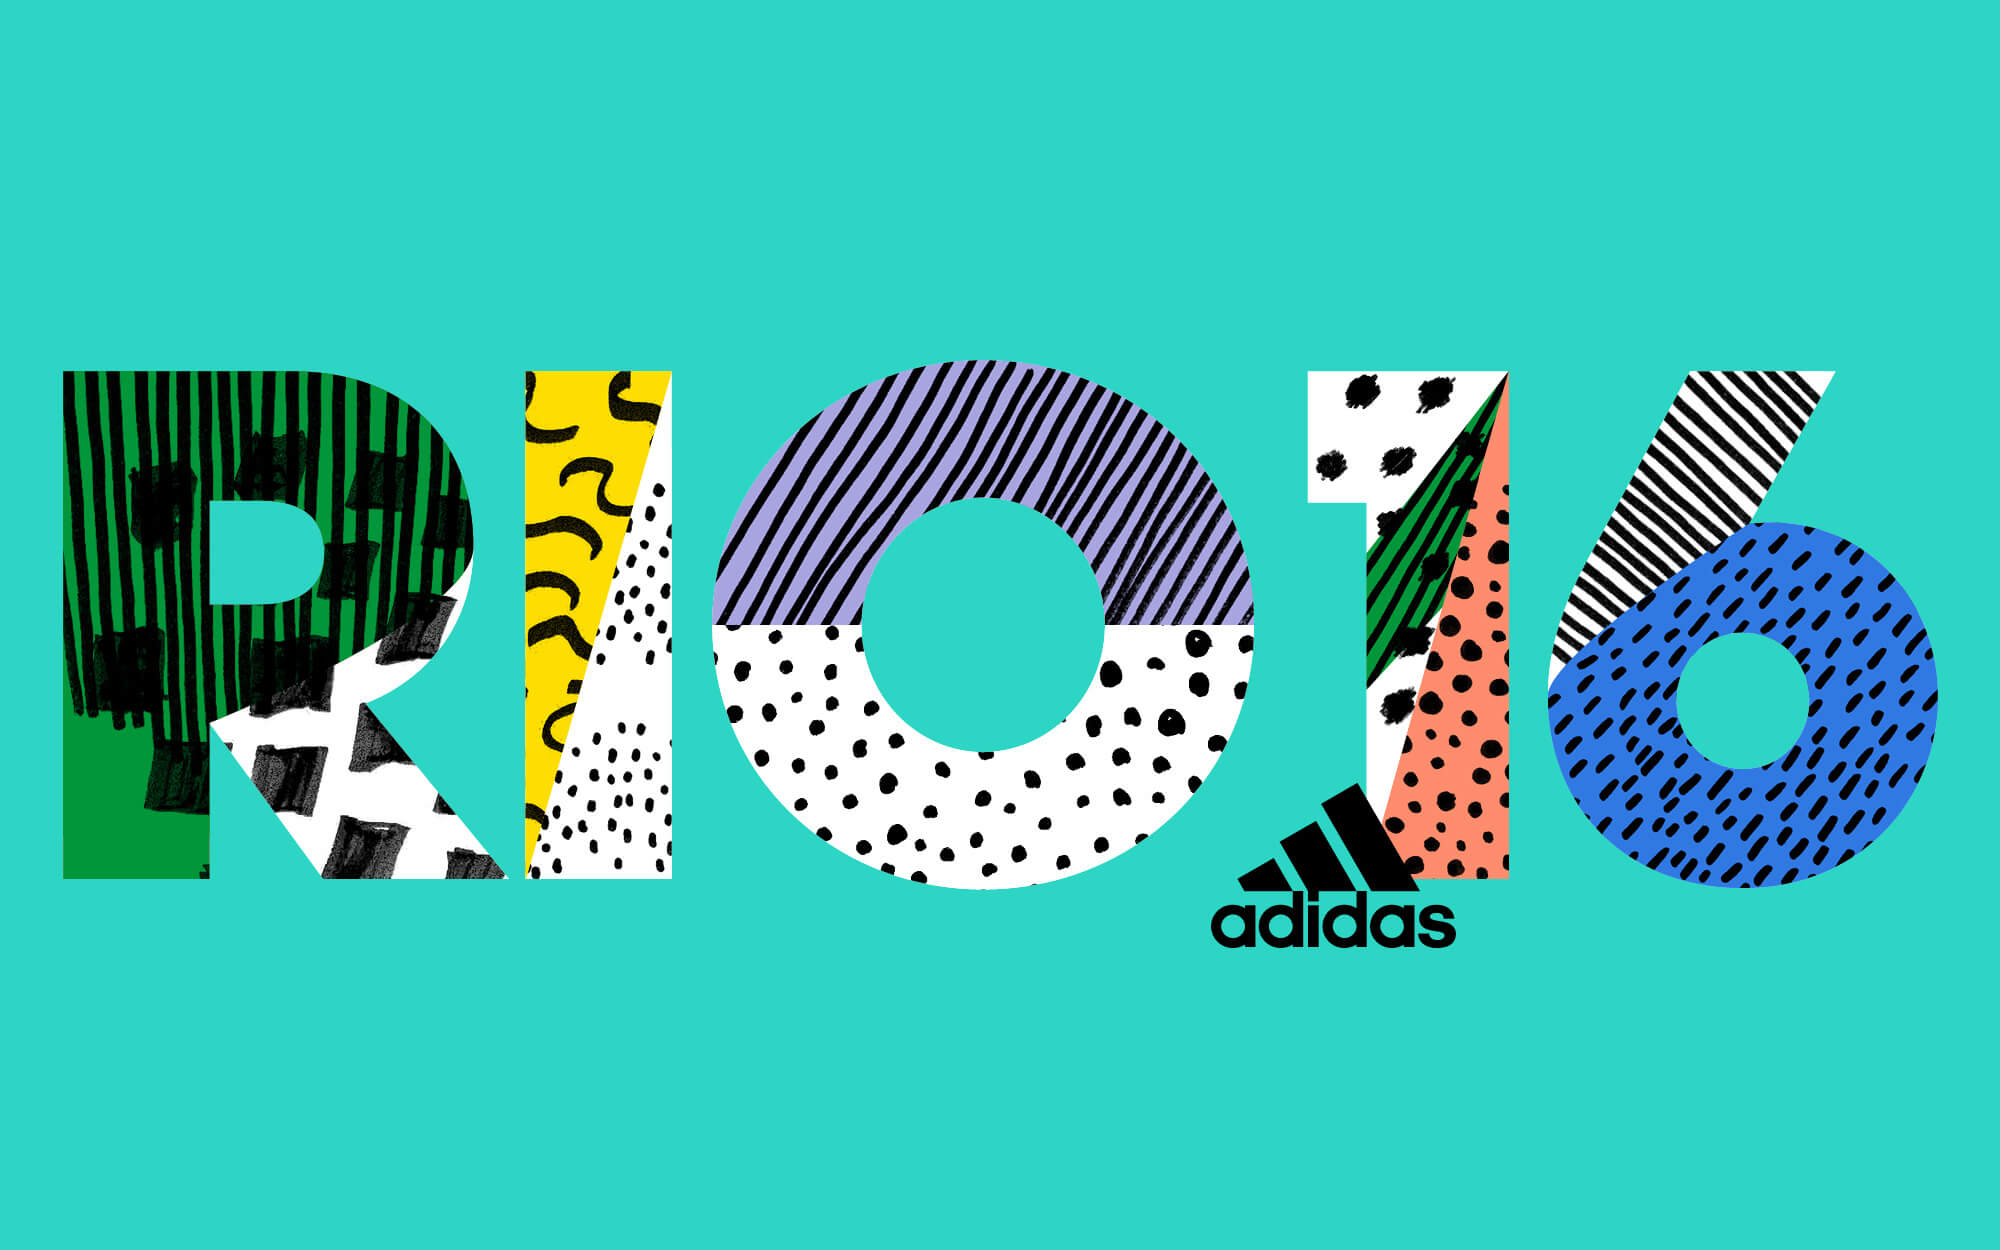 EIGA_adidas_TypeExploration_L_34